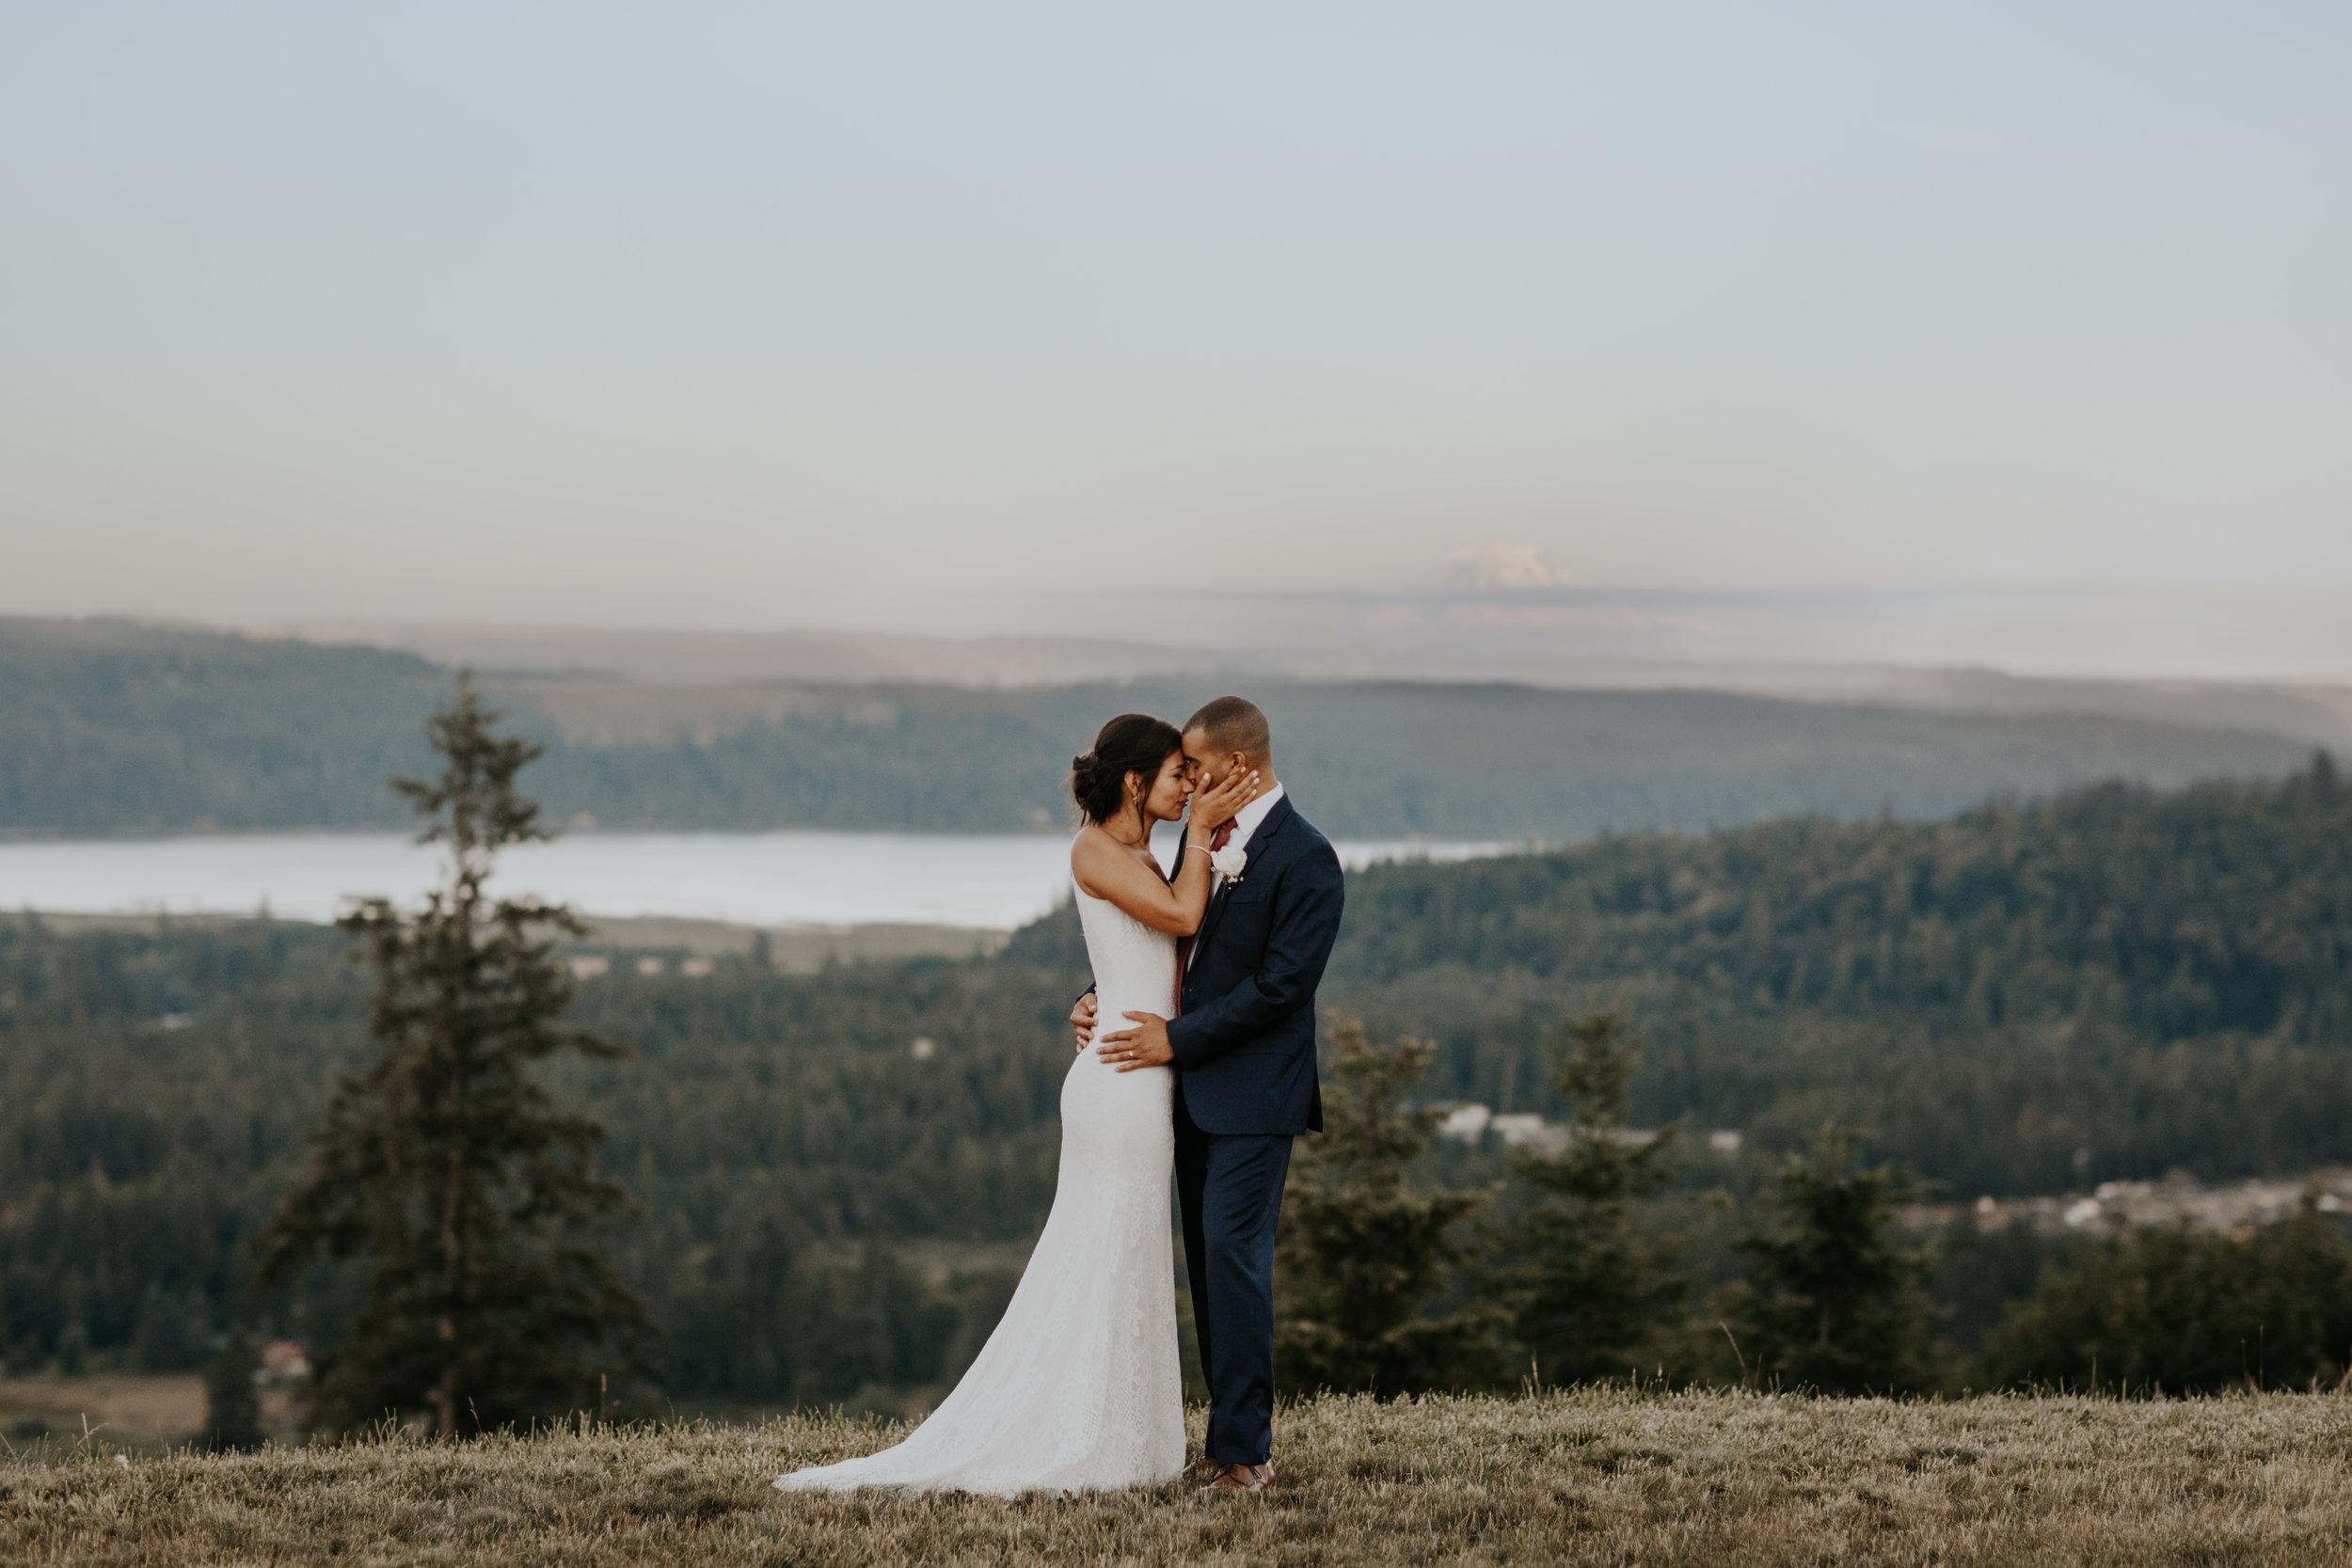 ginapaulson_aubreejeff_wedding-1032.jpg